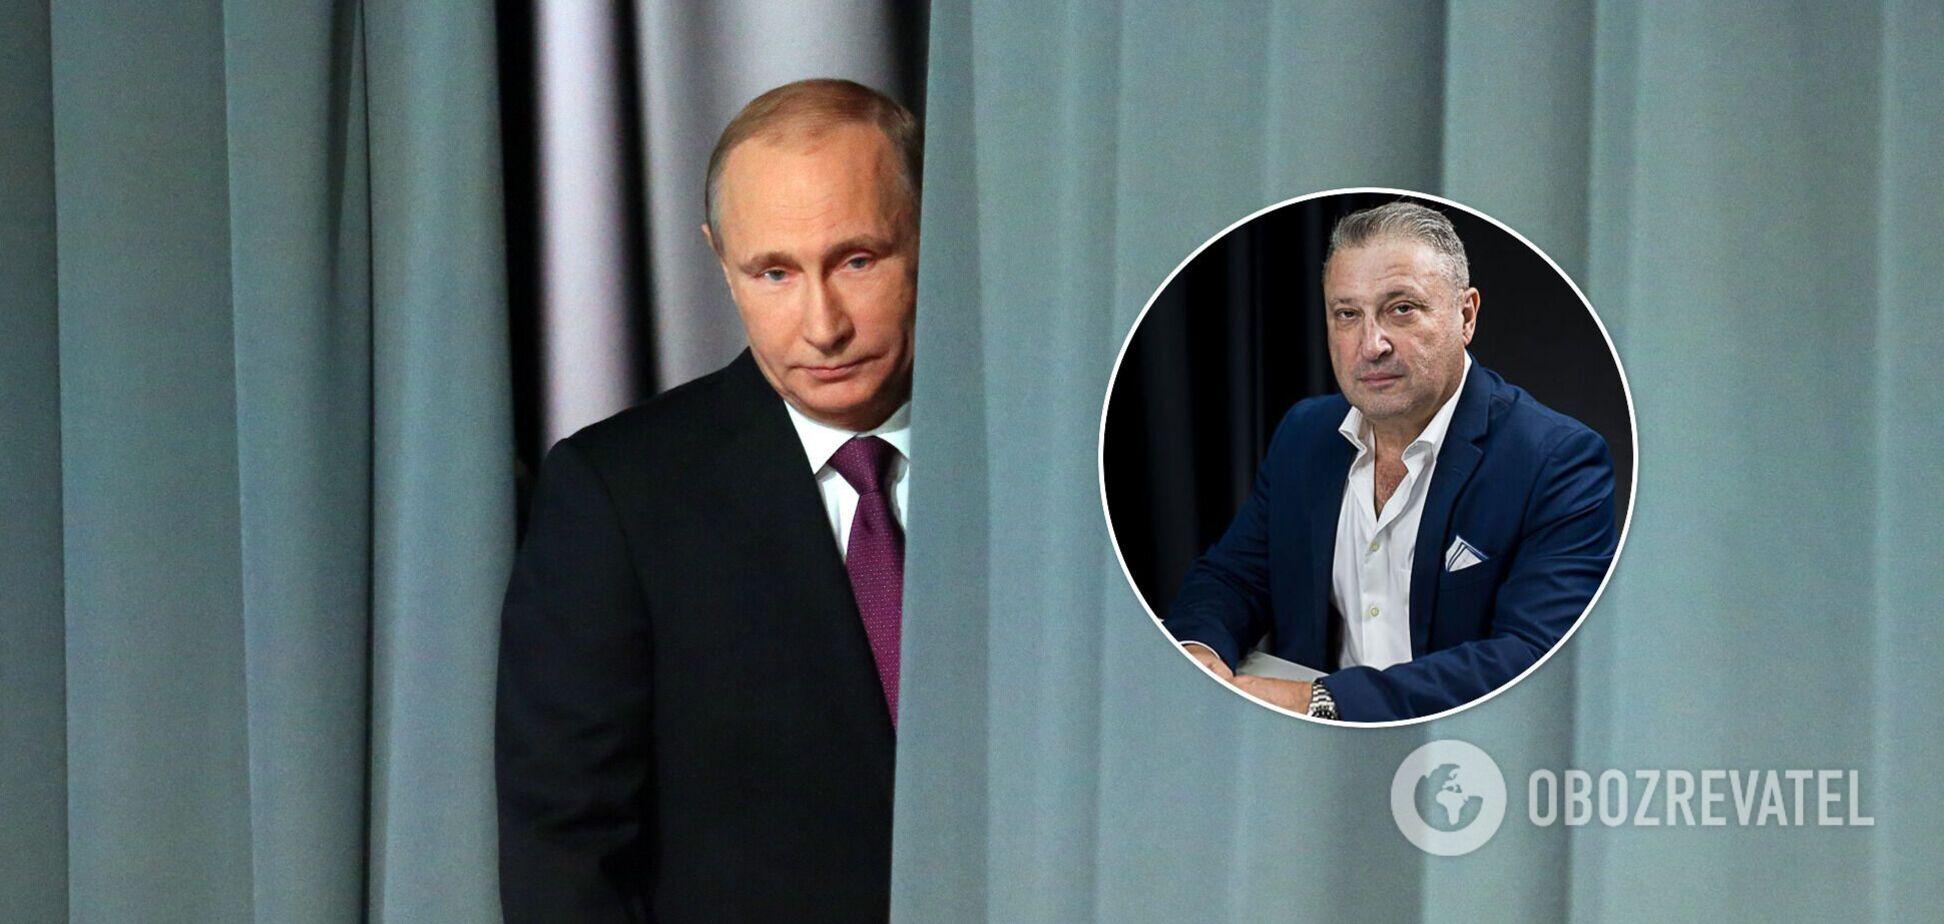 У Путіна параноя і арсенал металобрухту, він небезпечний, – офіцер НАТО